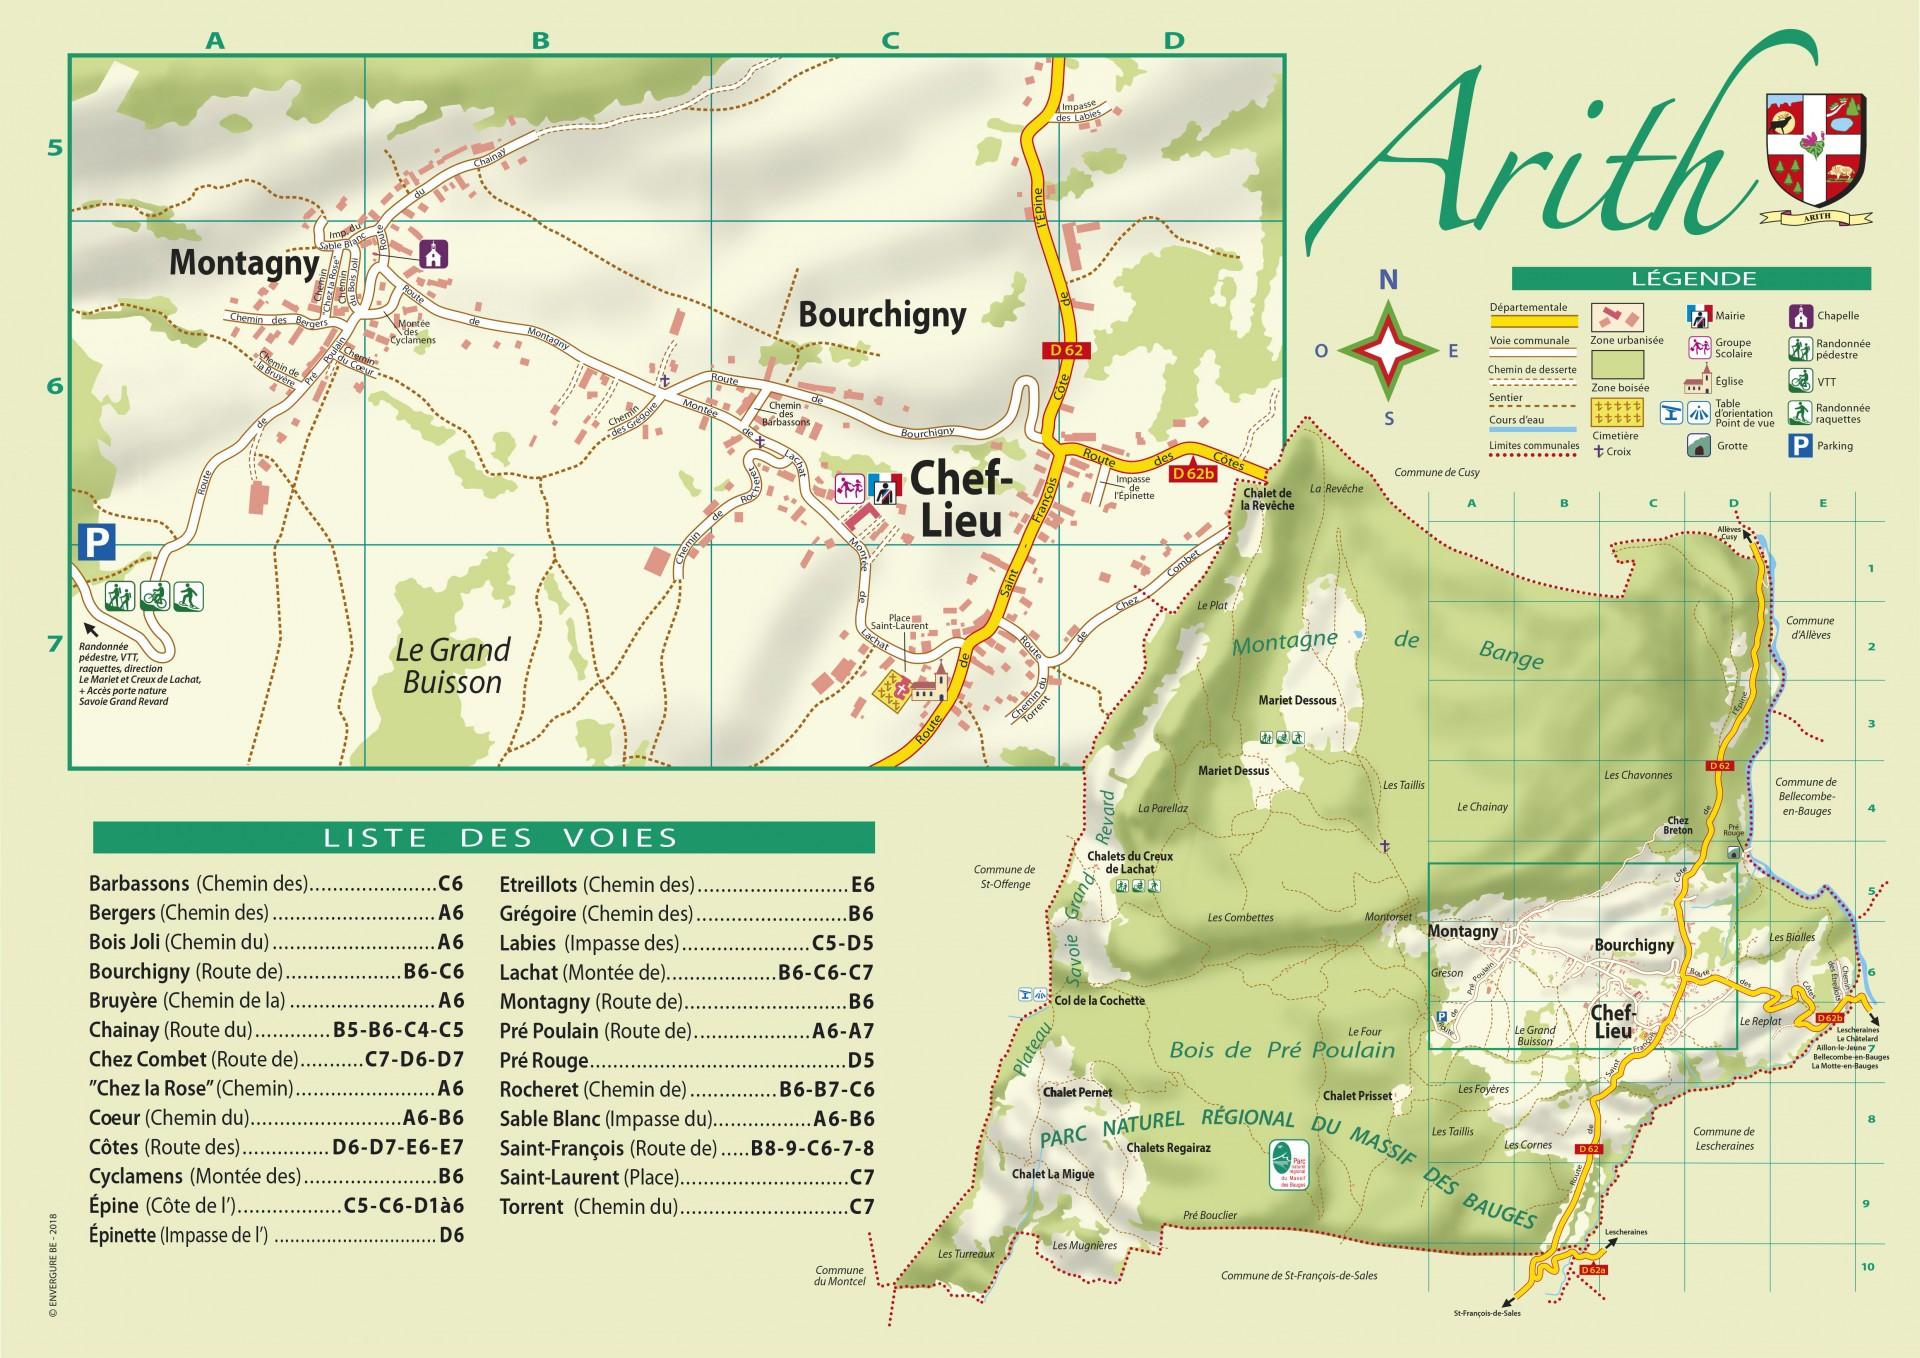 arith1-499